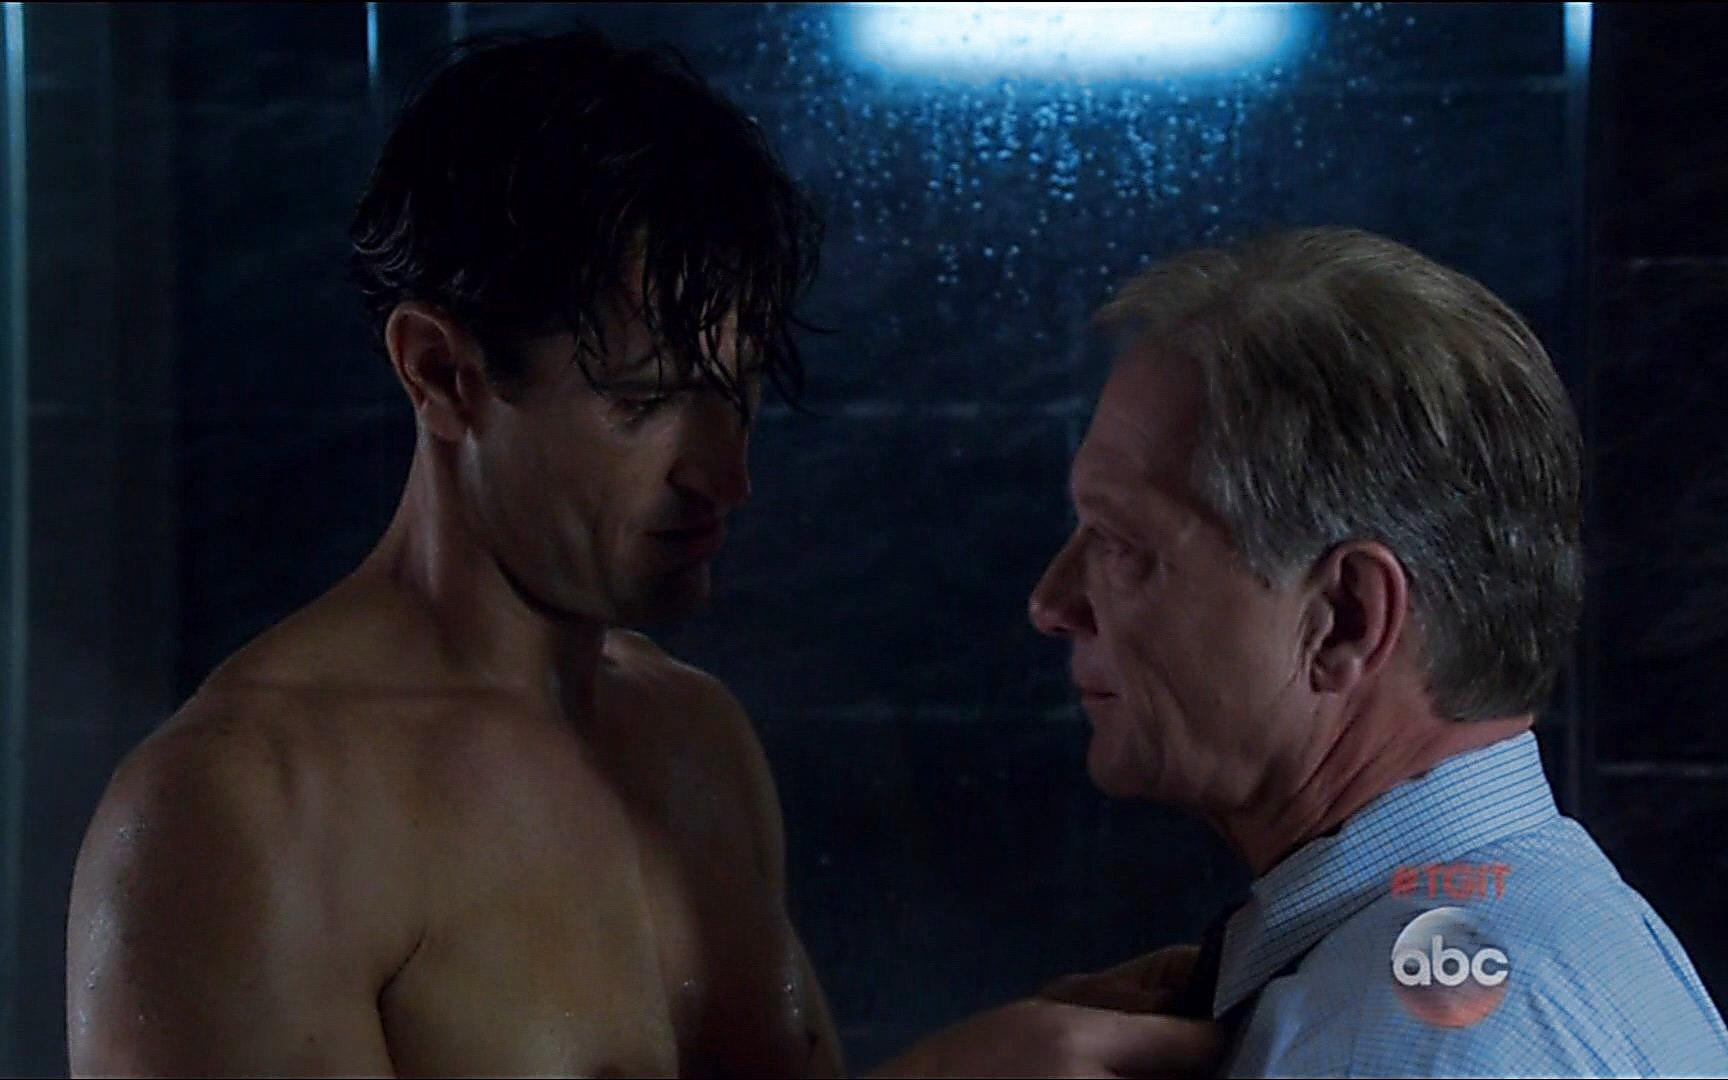 Scott Foley sexy shirtless scene January 3, 2015, 3am